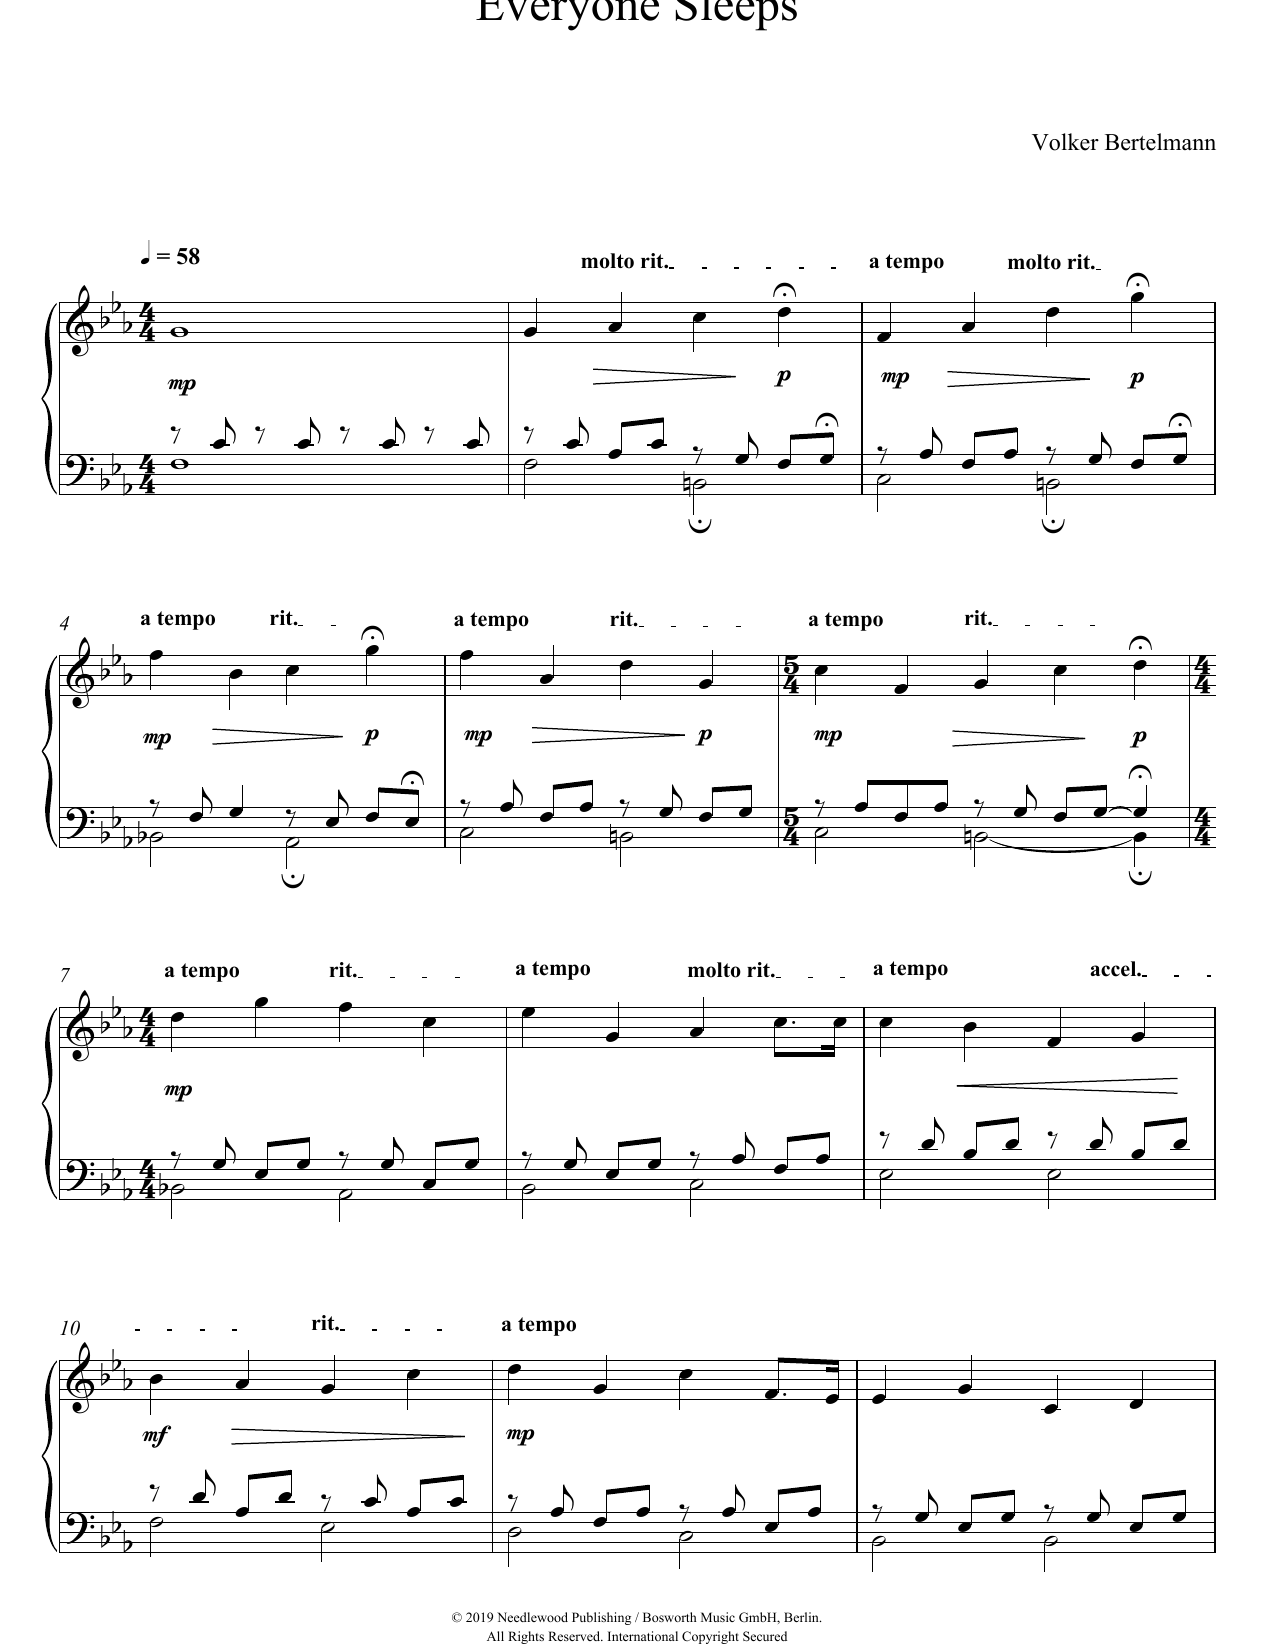 Everyone Sleeps (Piano Solo)